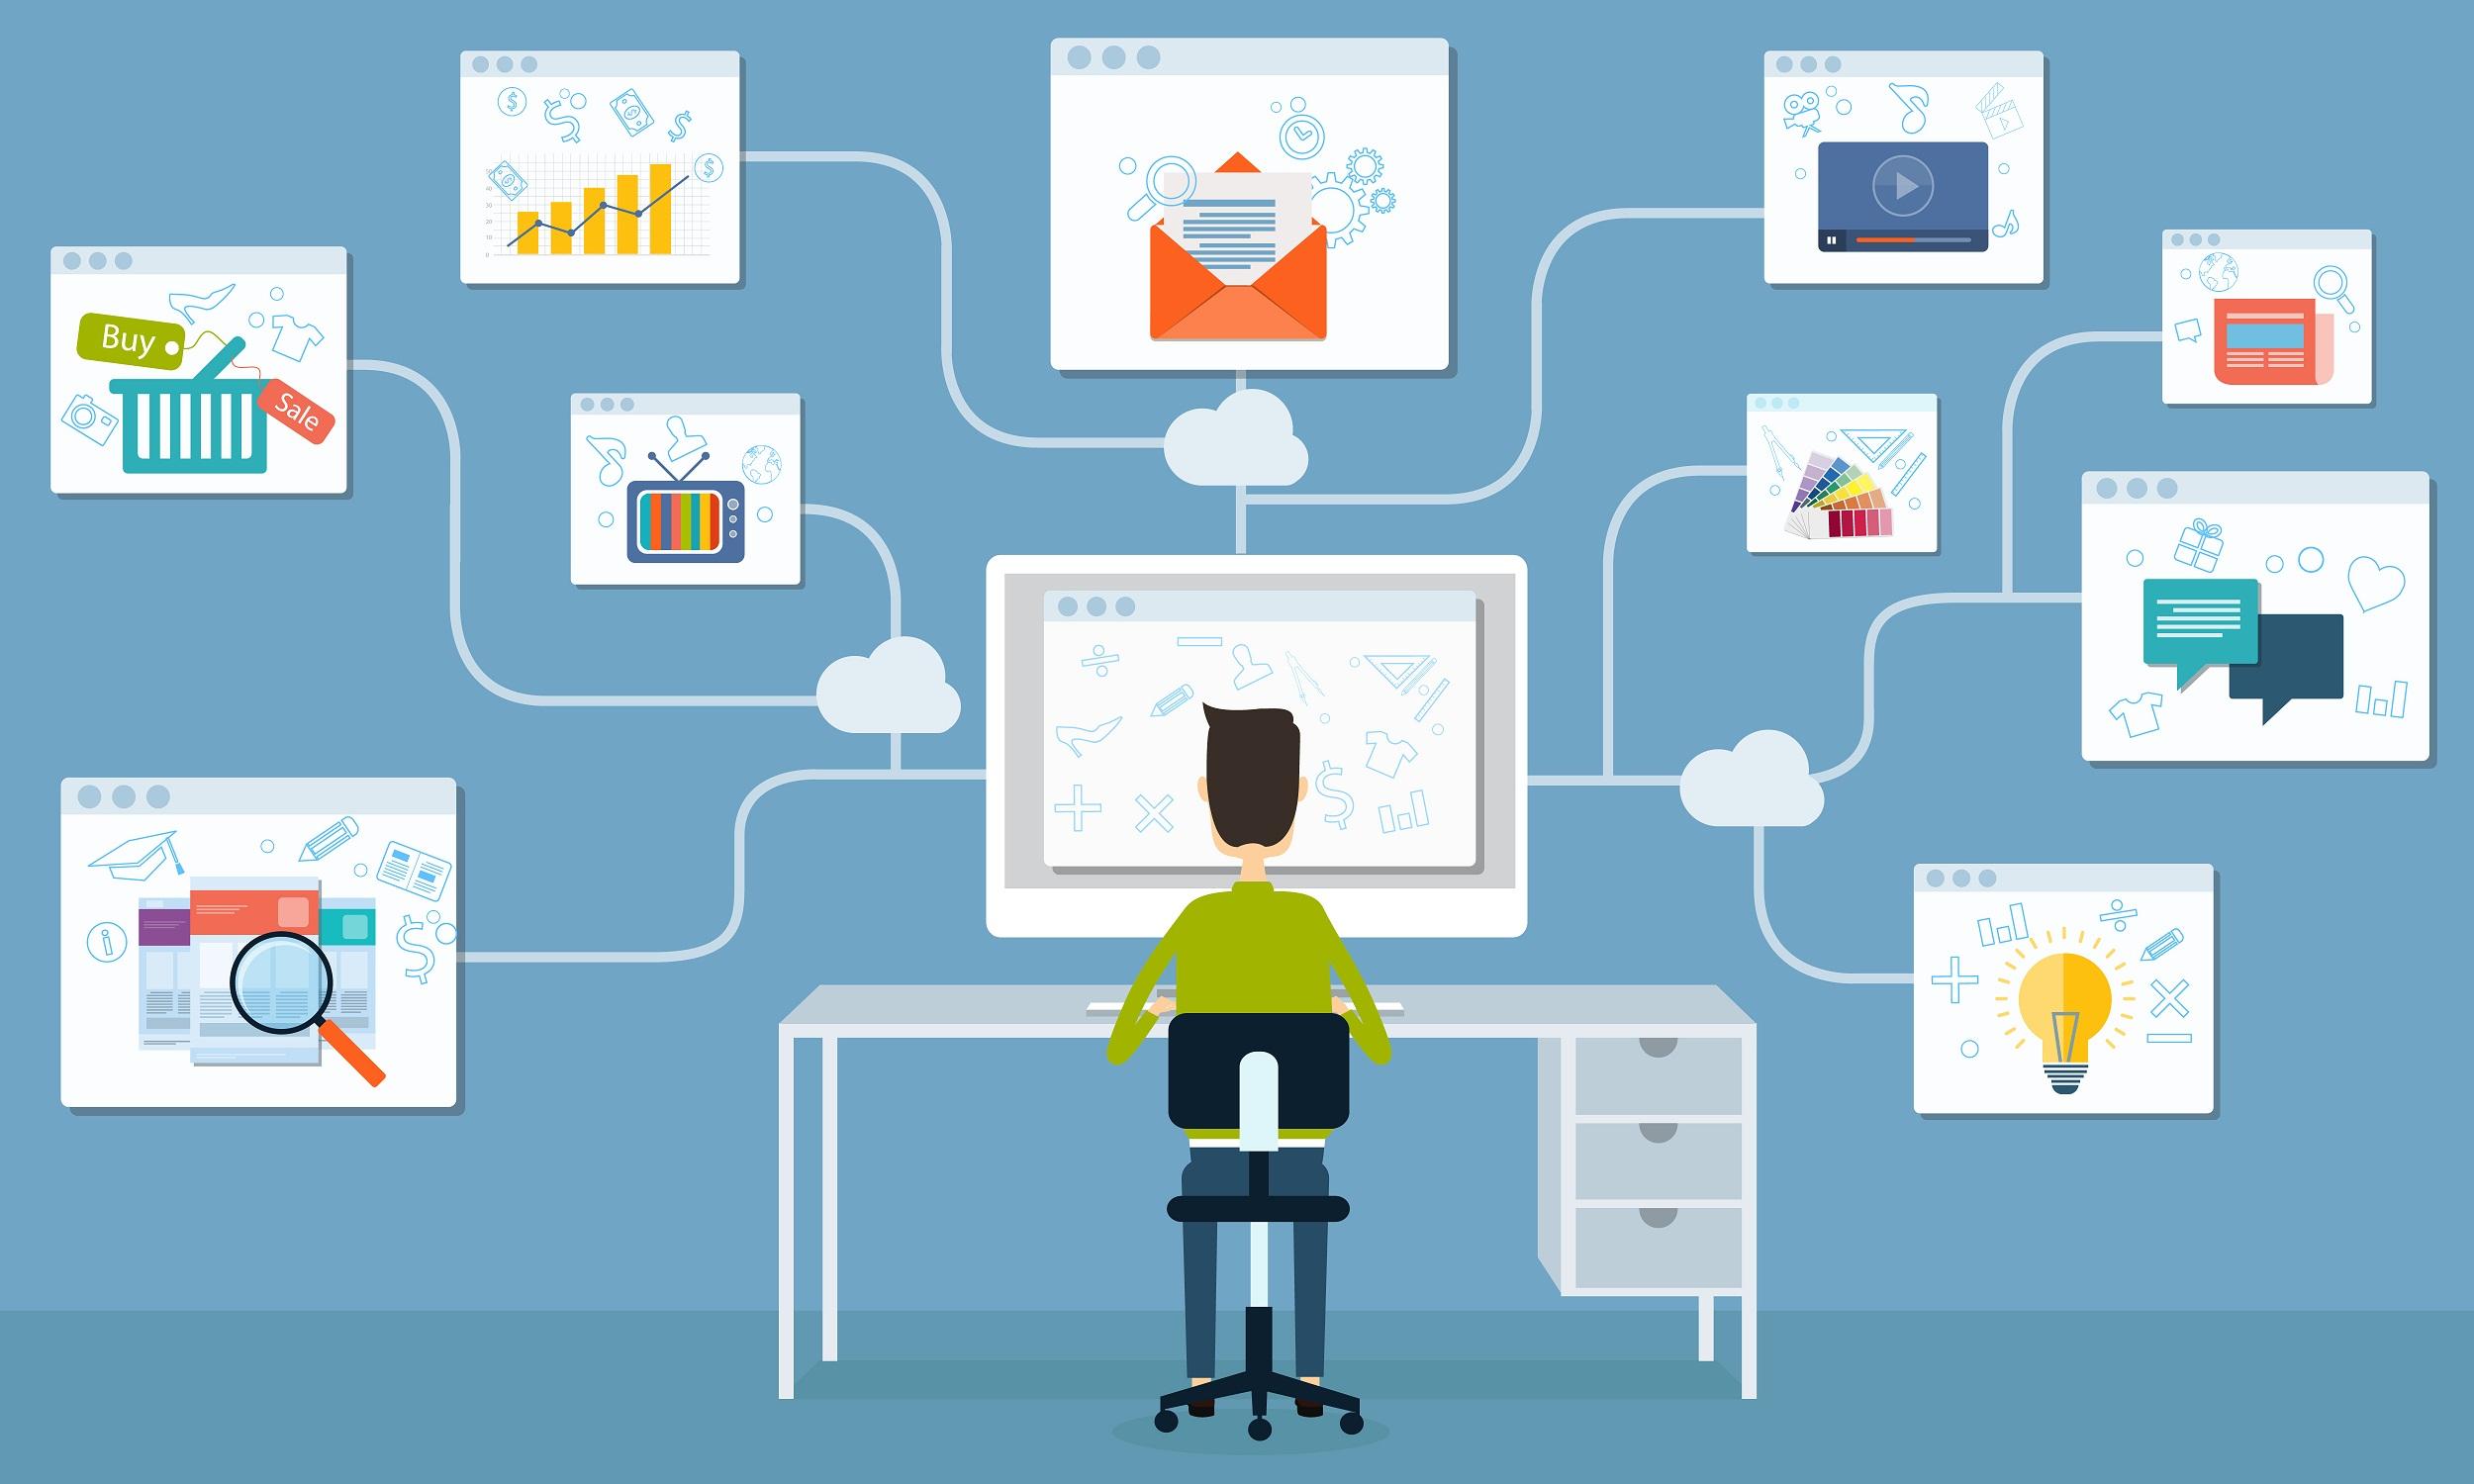 kinh doanh trên Facebook, kinh doanh online